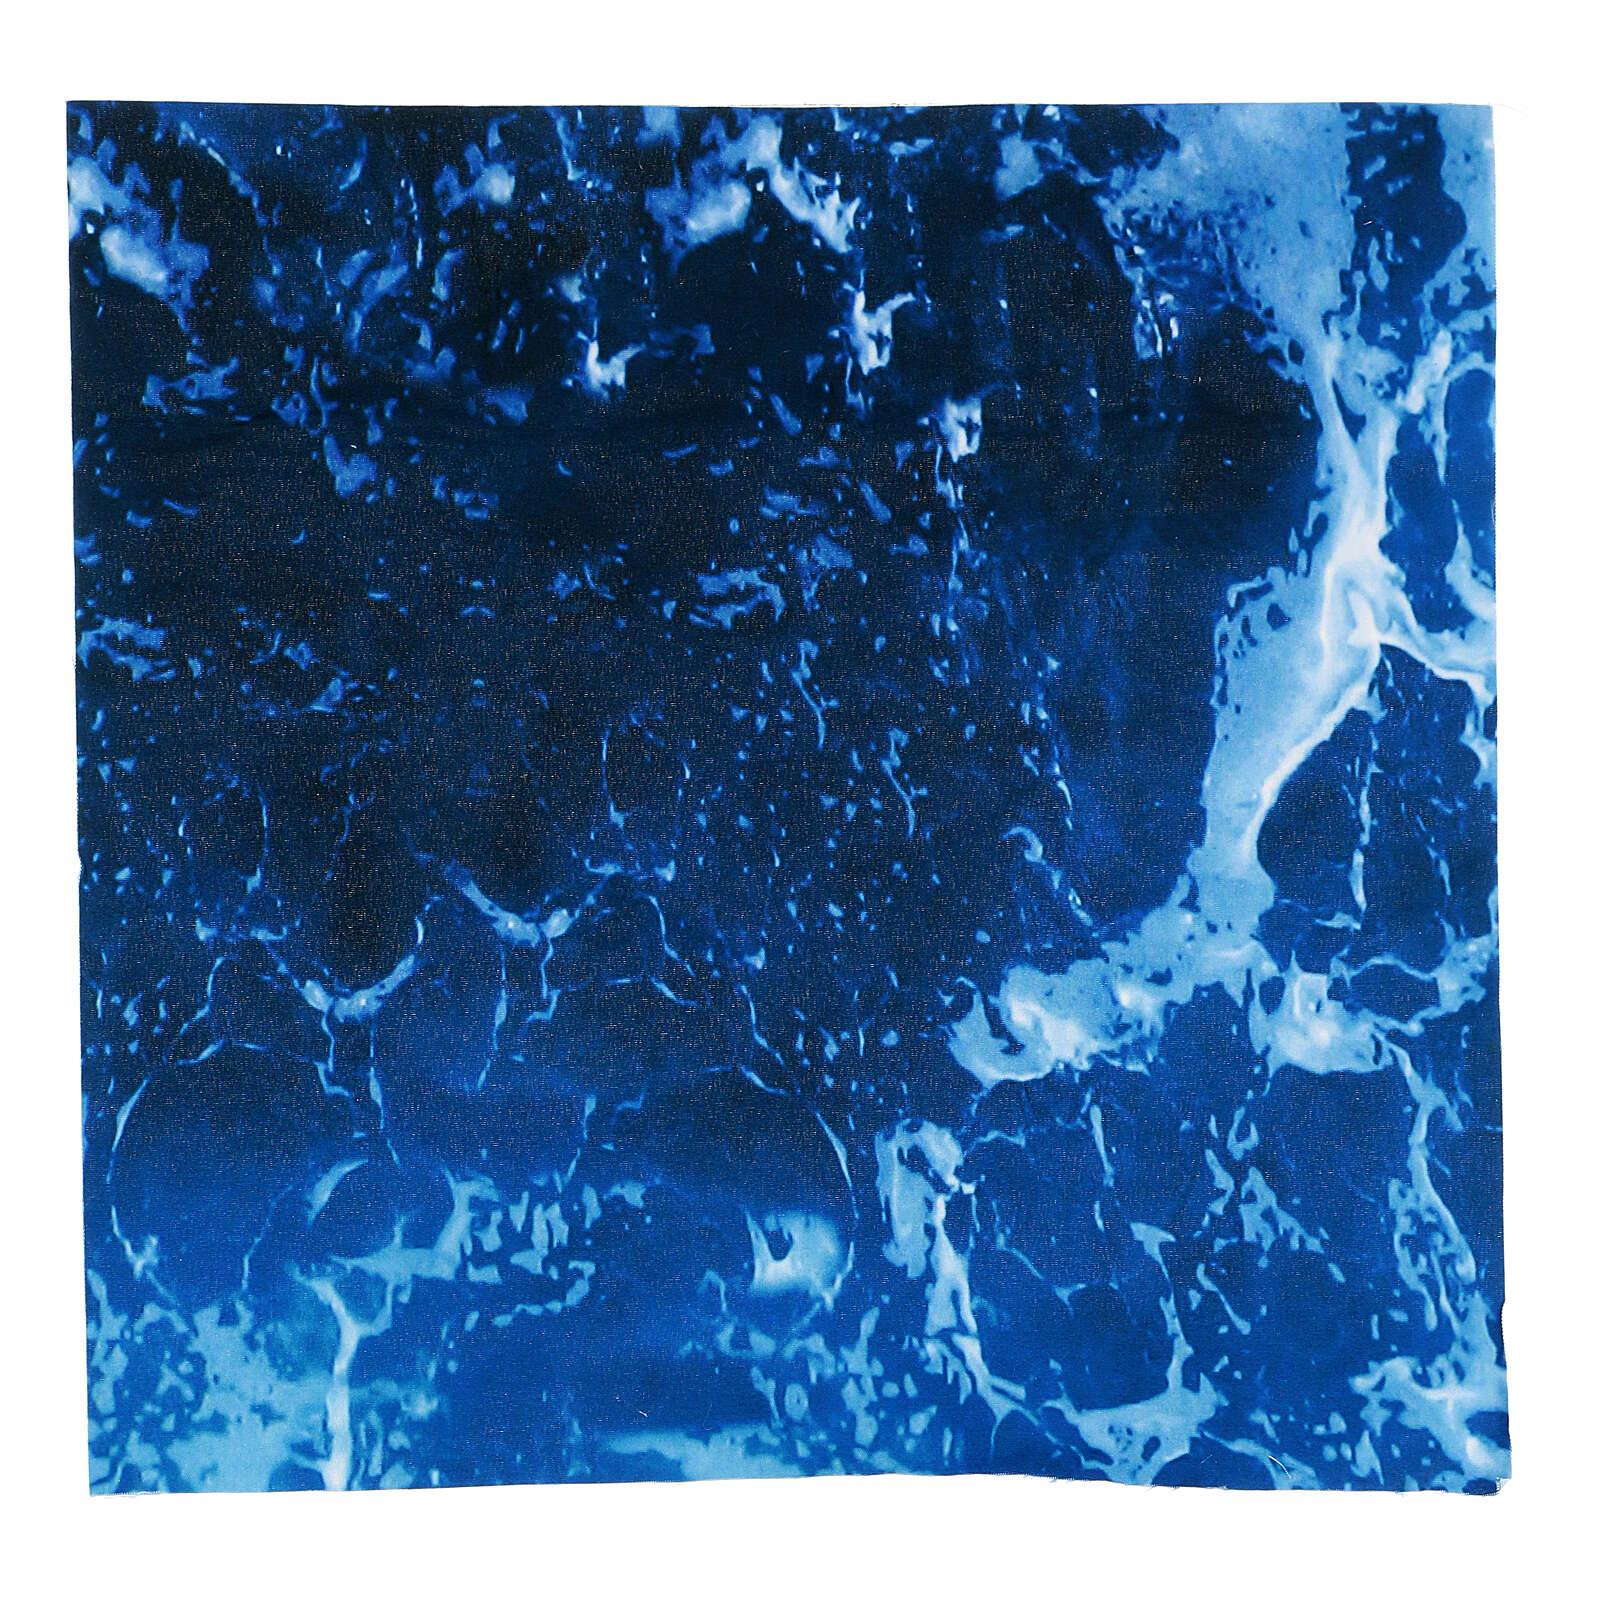 Water nativity backdrop paper 30x30 cm 4